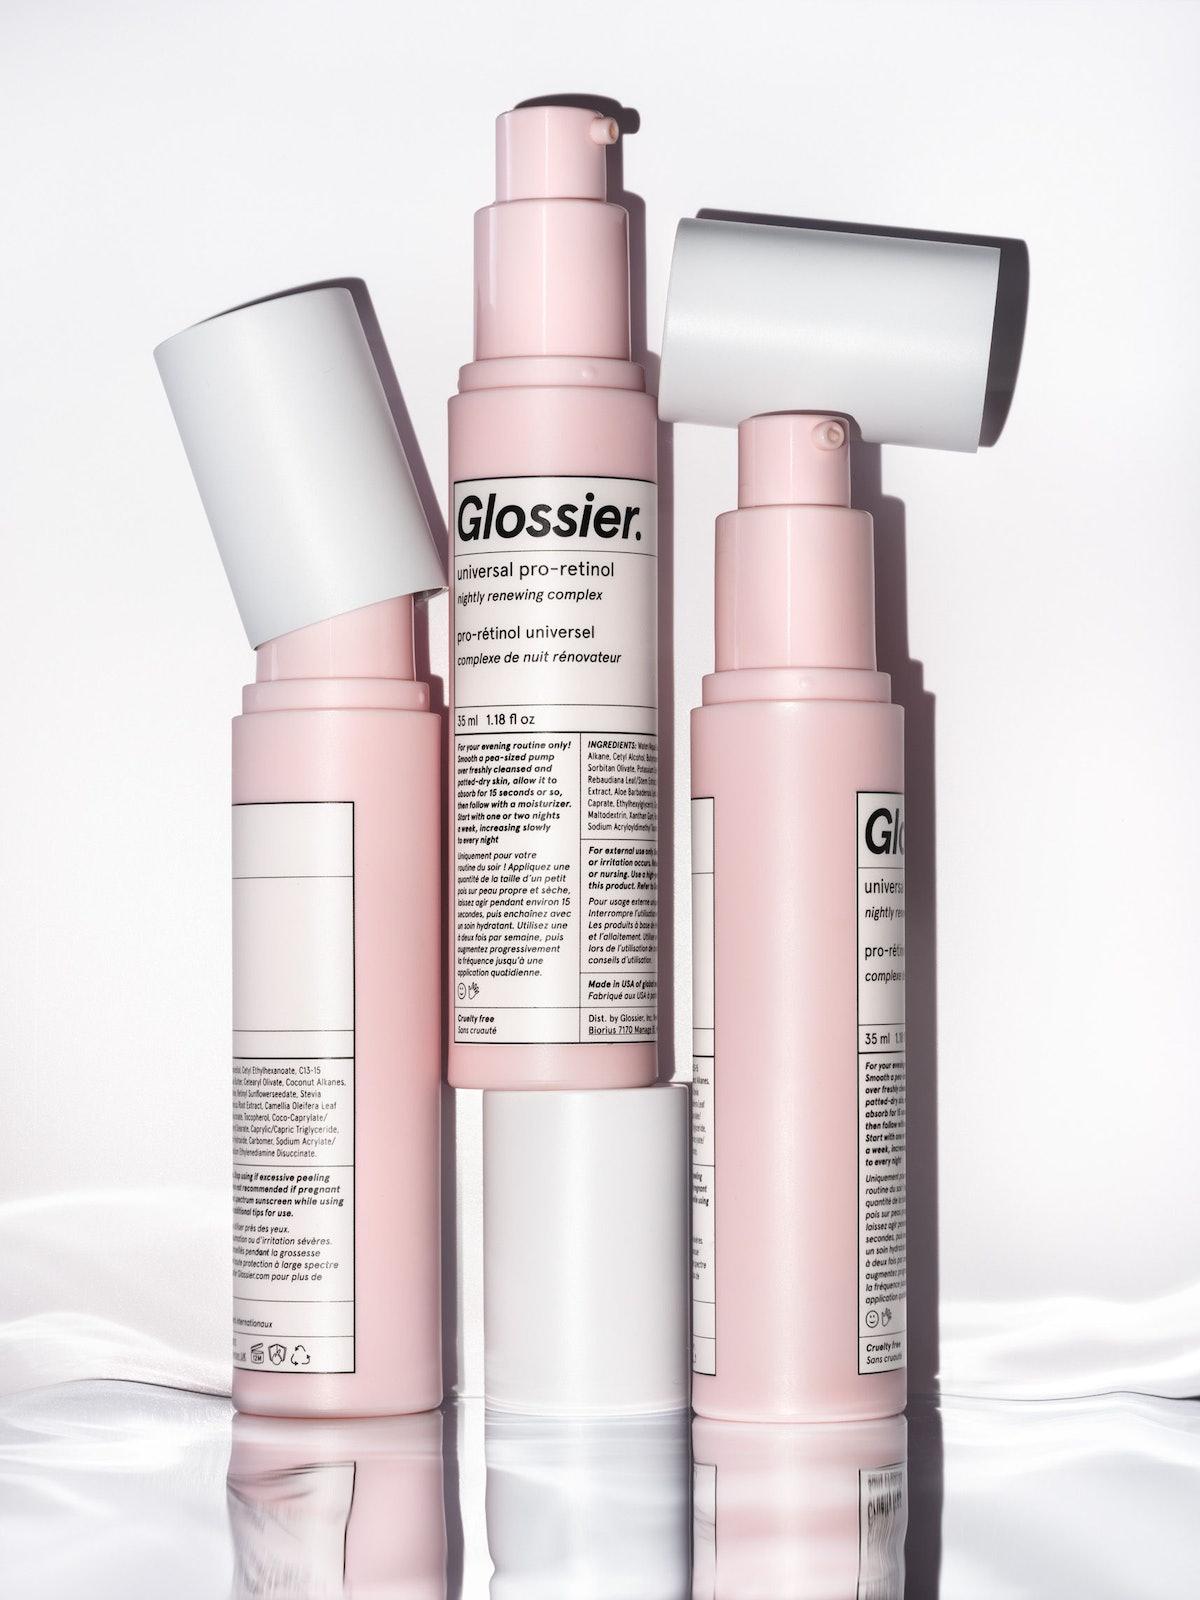 A product photo of Glossier's new Universal Pro-Retinol.